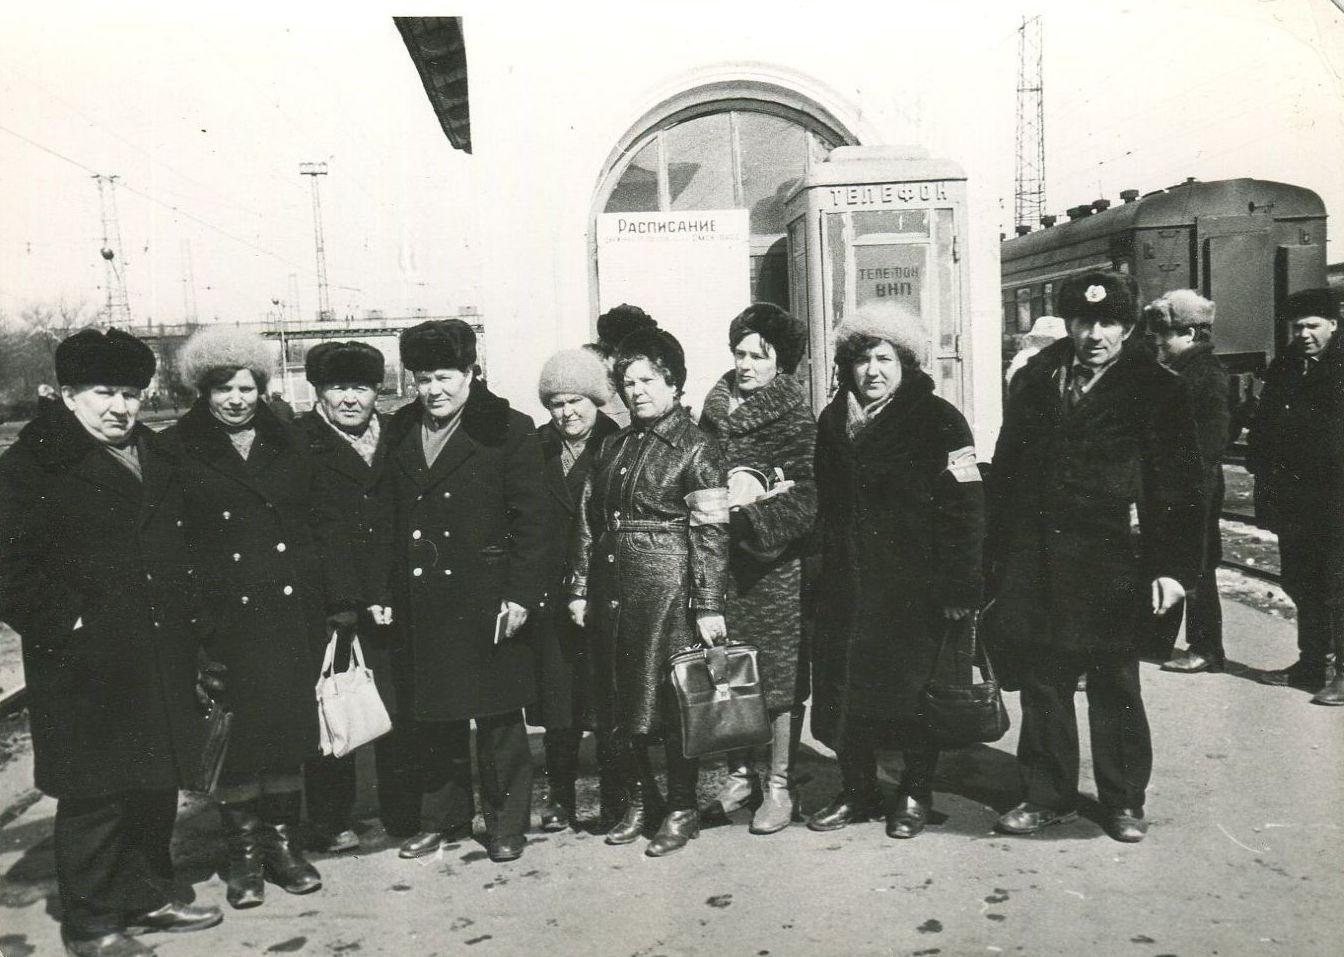 rjynhjkths 1984